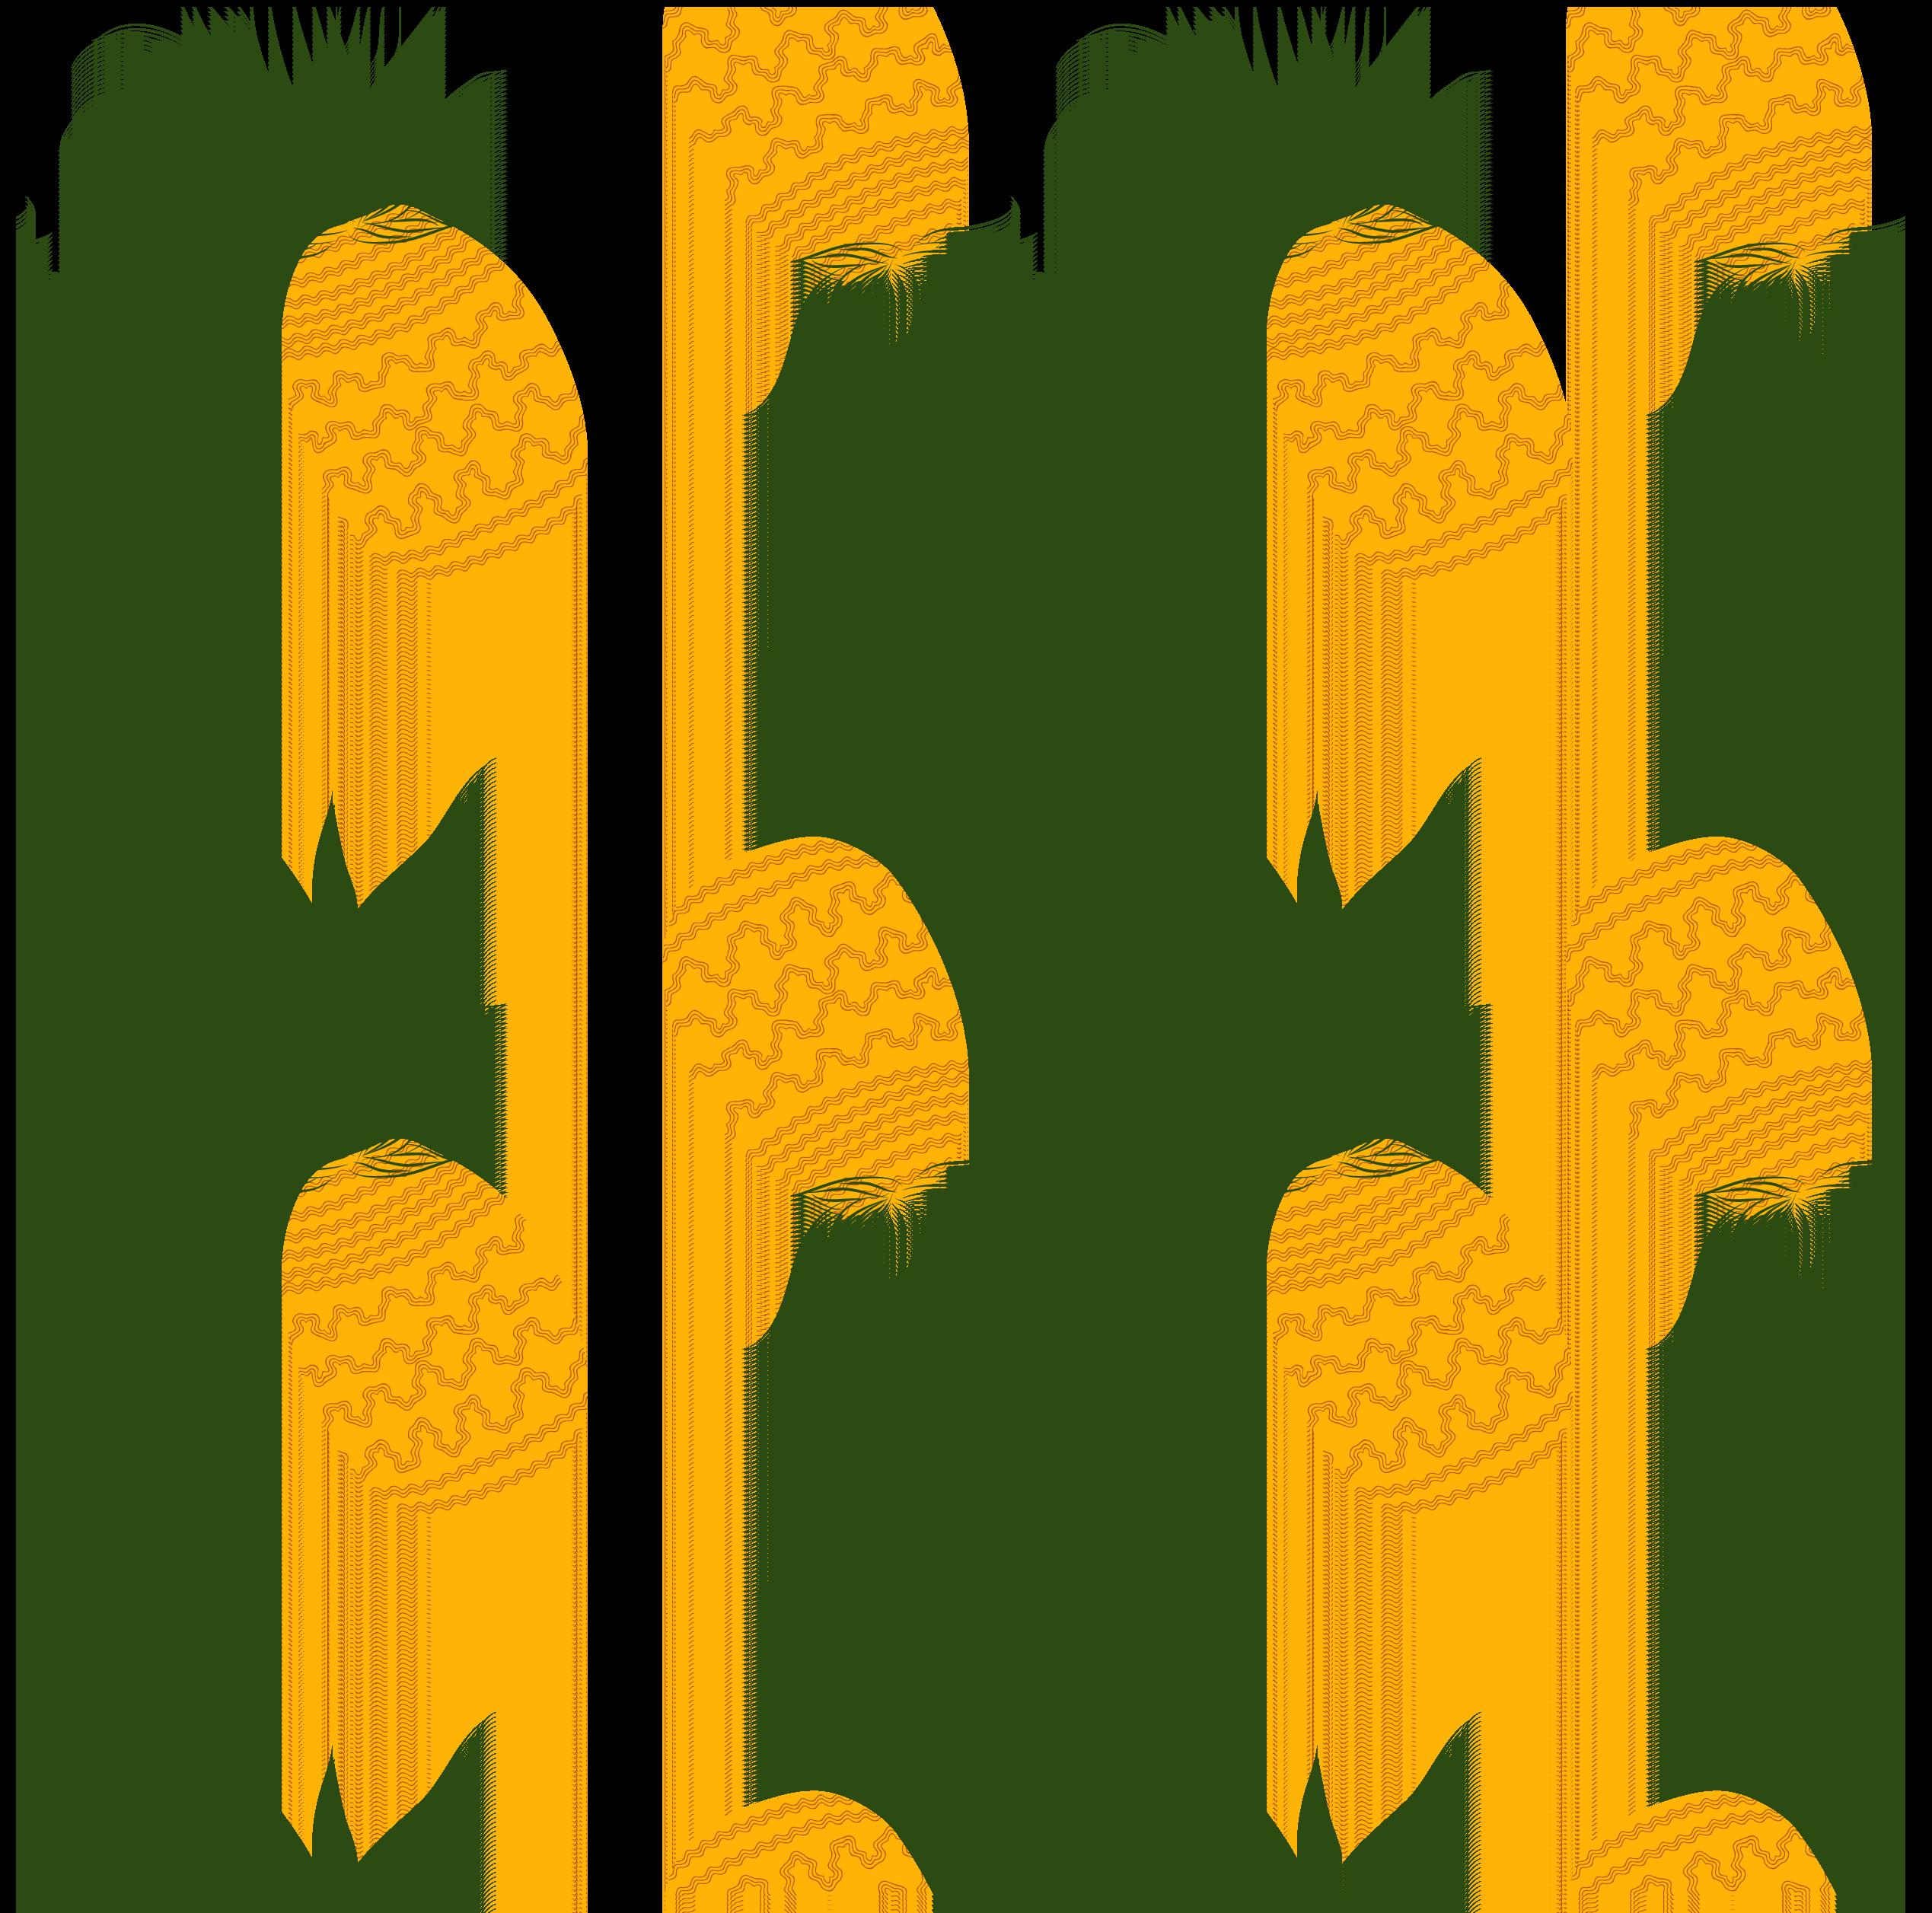 Juice slice fruit background. Clipart pineapple floral